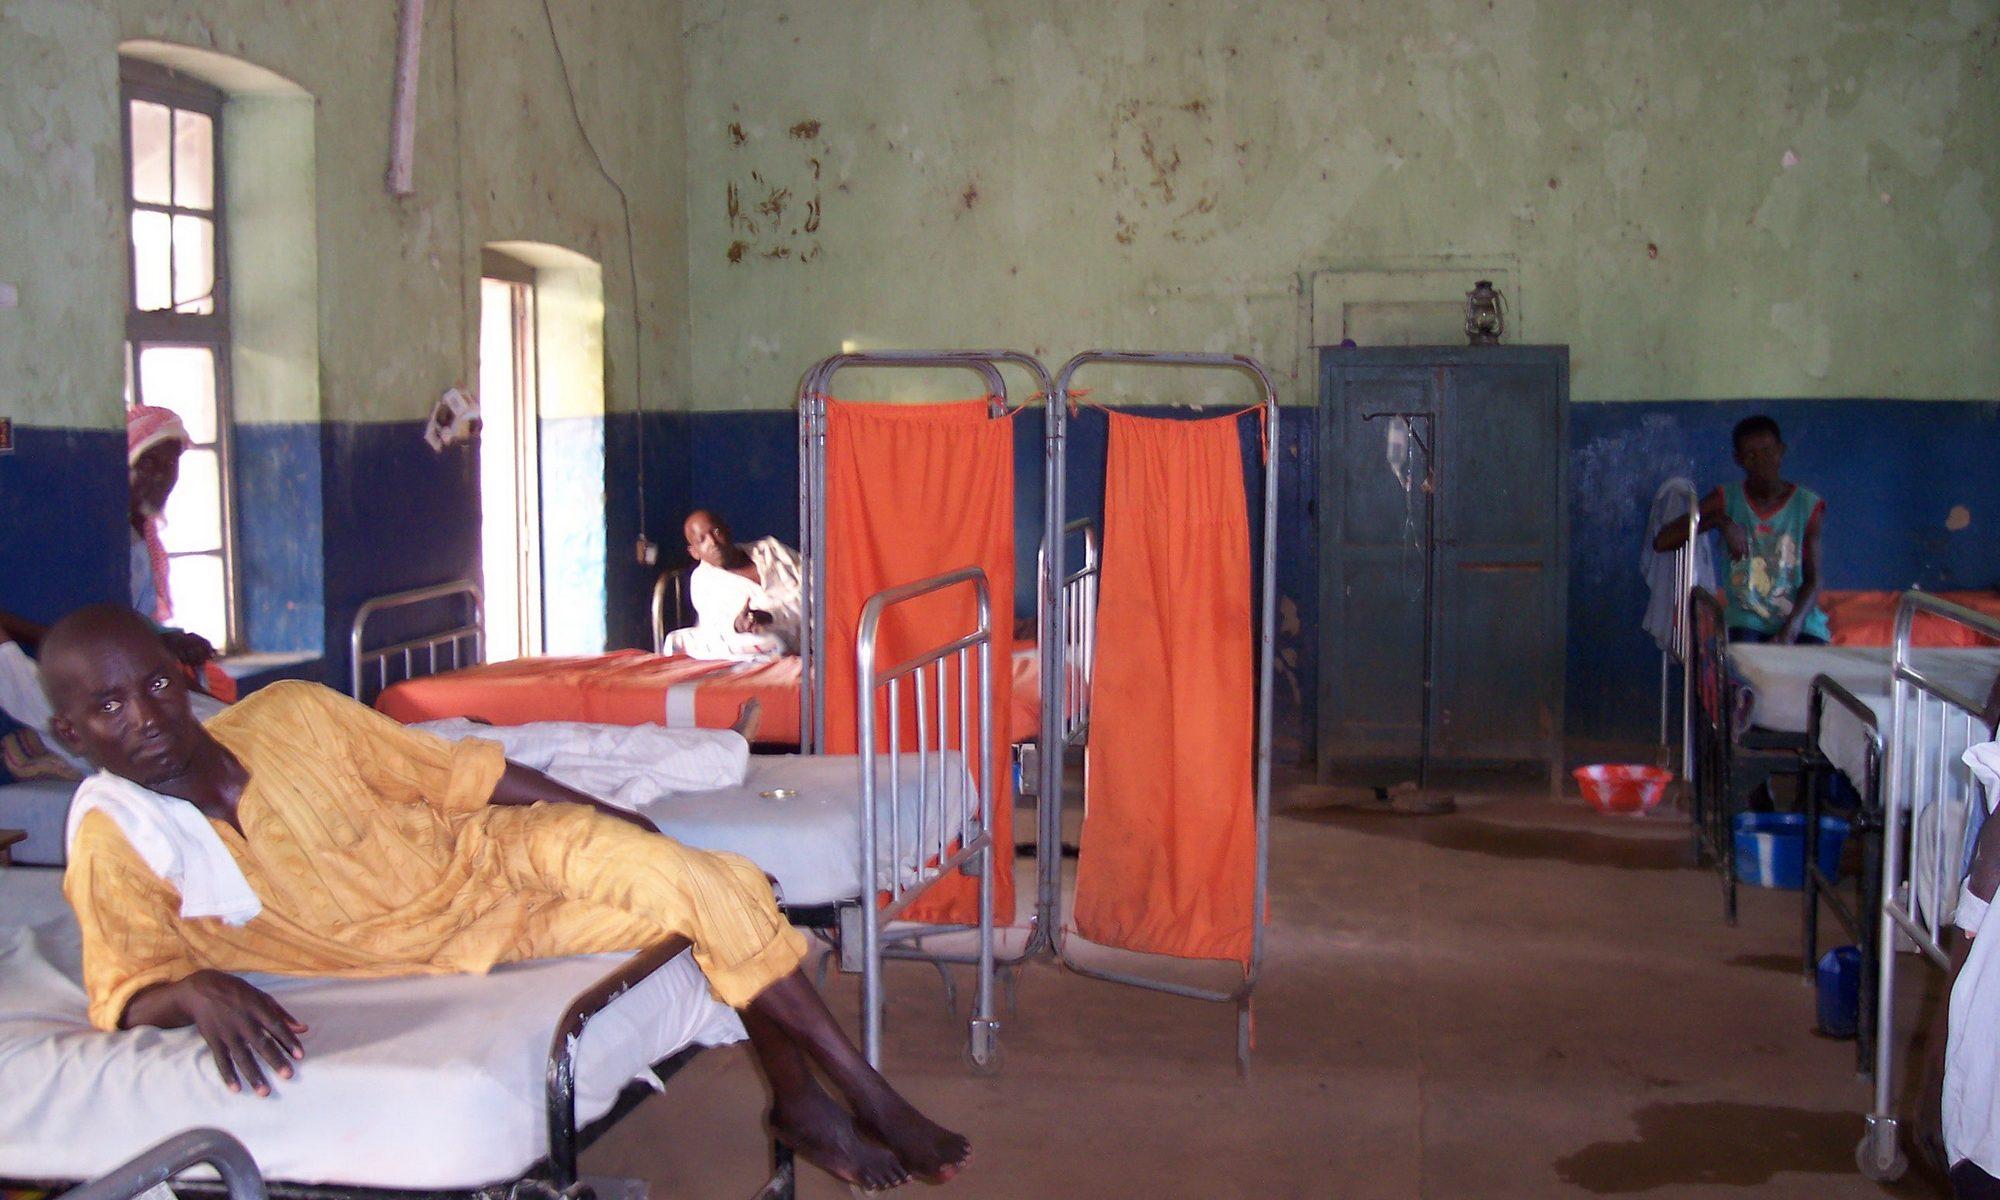 Hospital Ward in Africa